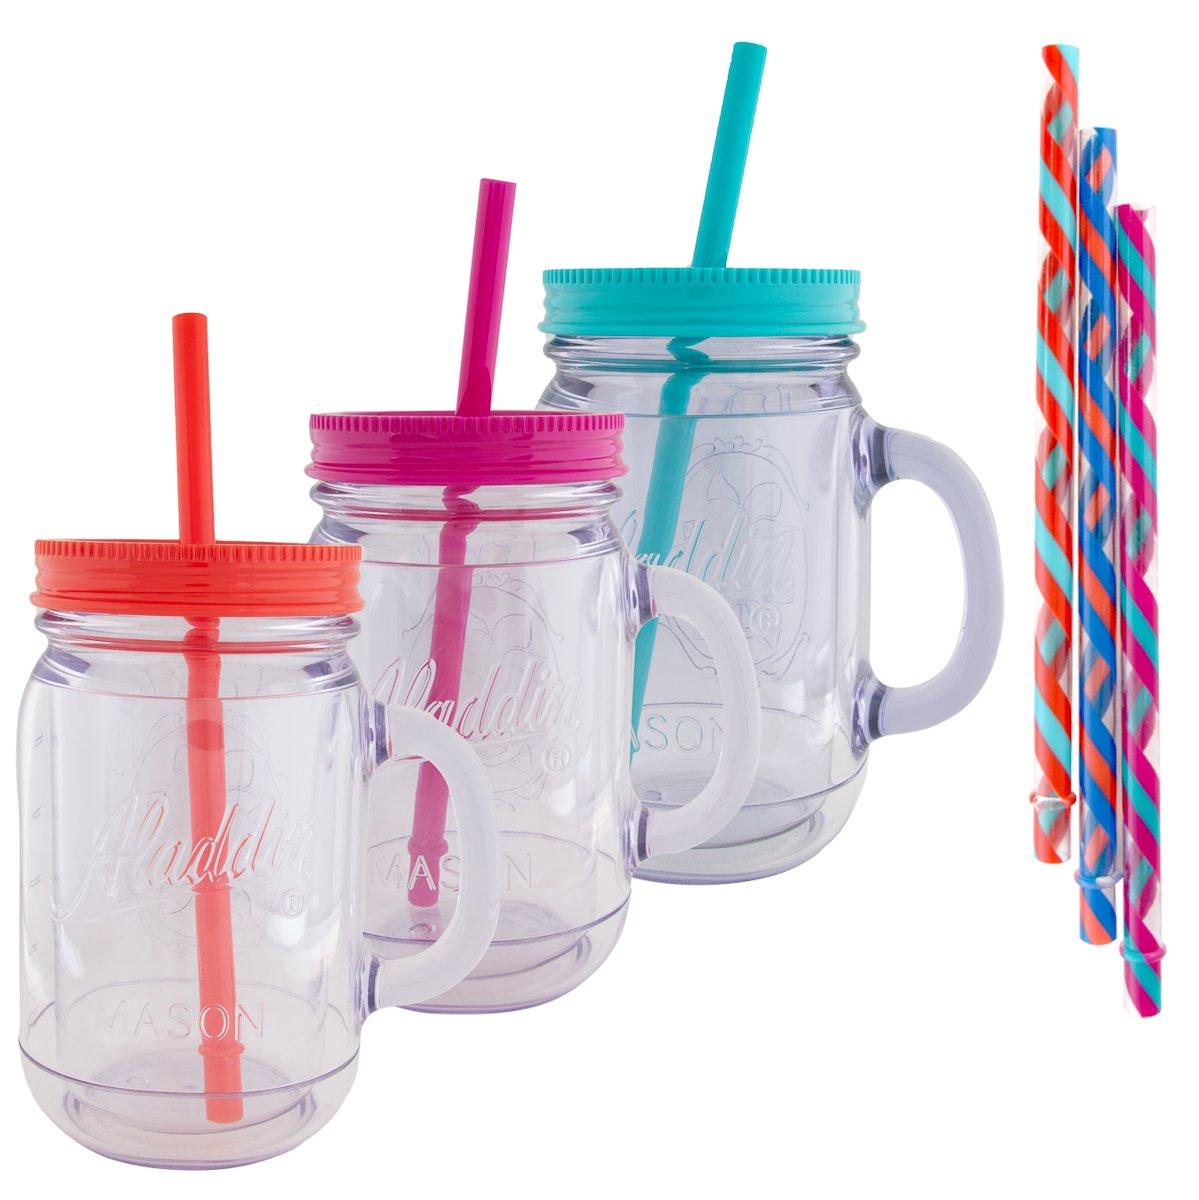 Aladdin (3 Pack) 20oz Plastic Mason Jar Tumbler With Straw and Lid Temperature Control Travel Home Mason Jars